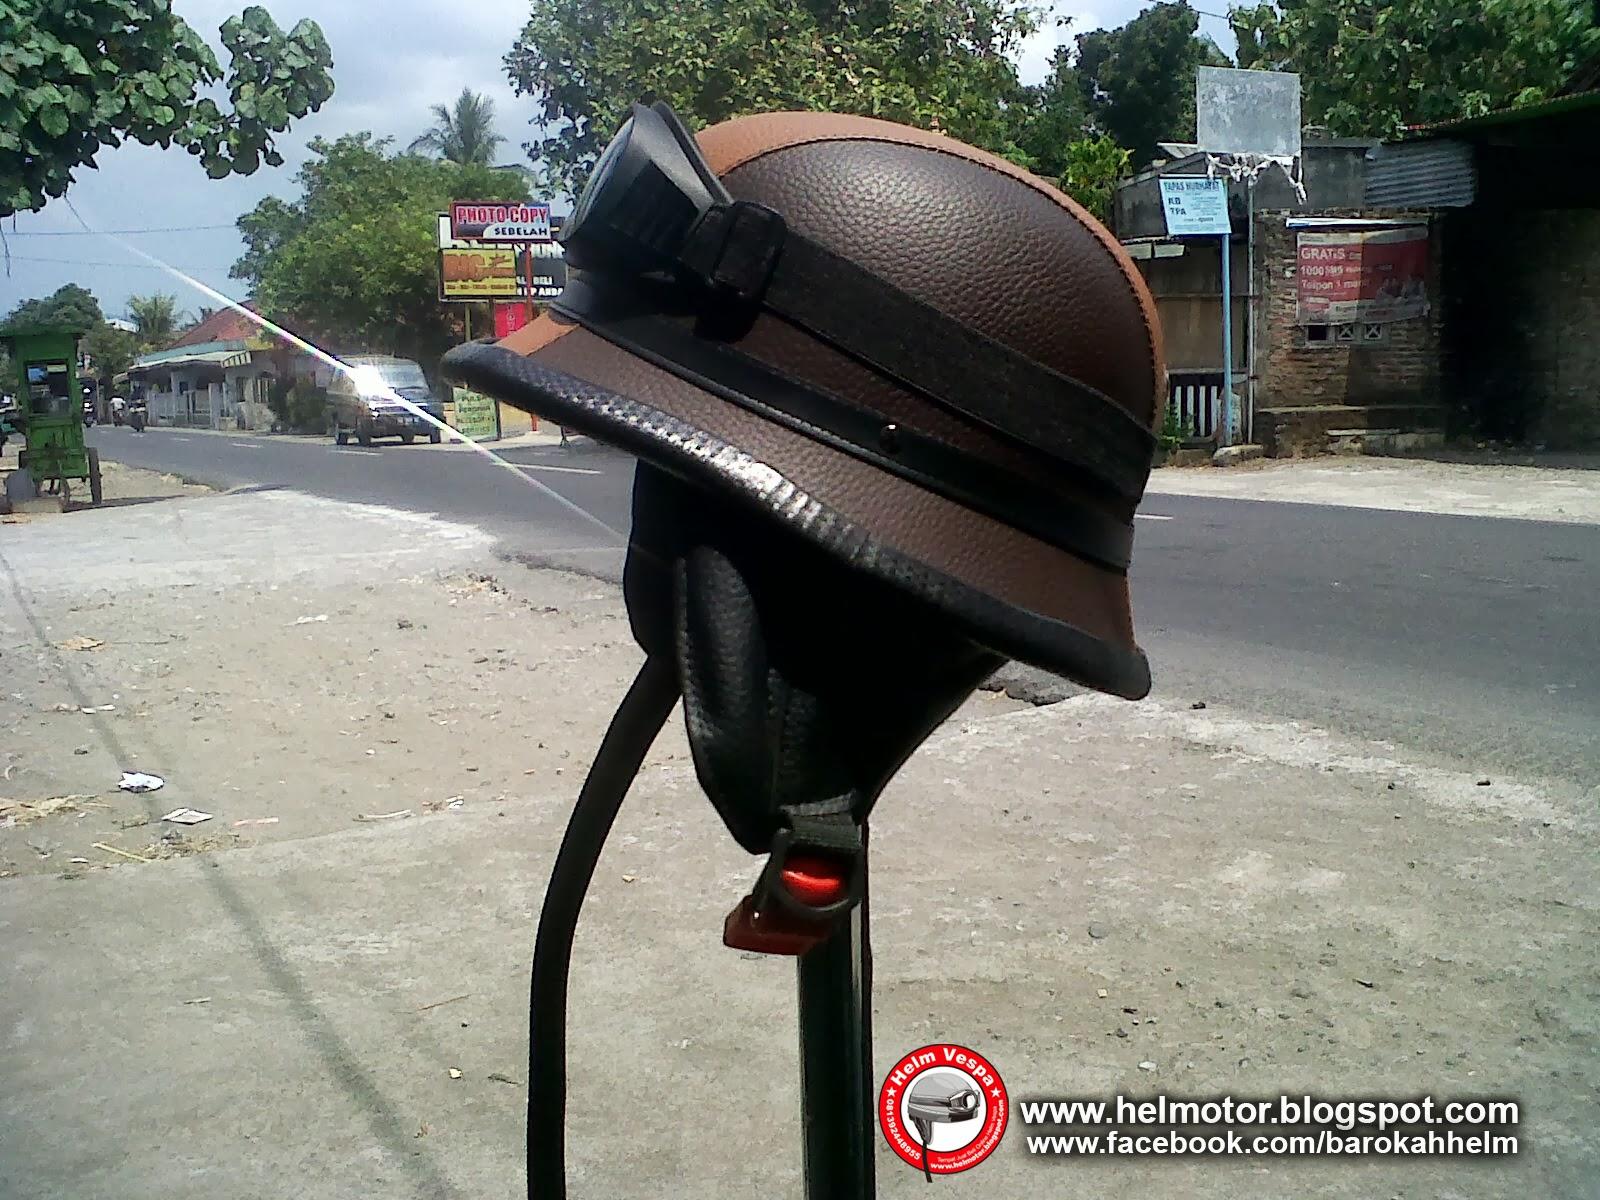 Helm Nazi CKTM  Helm Vespa